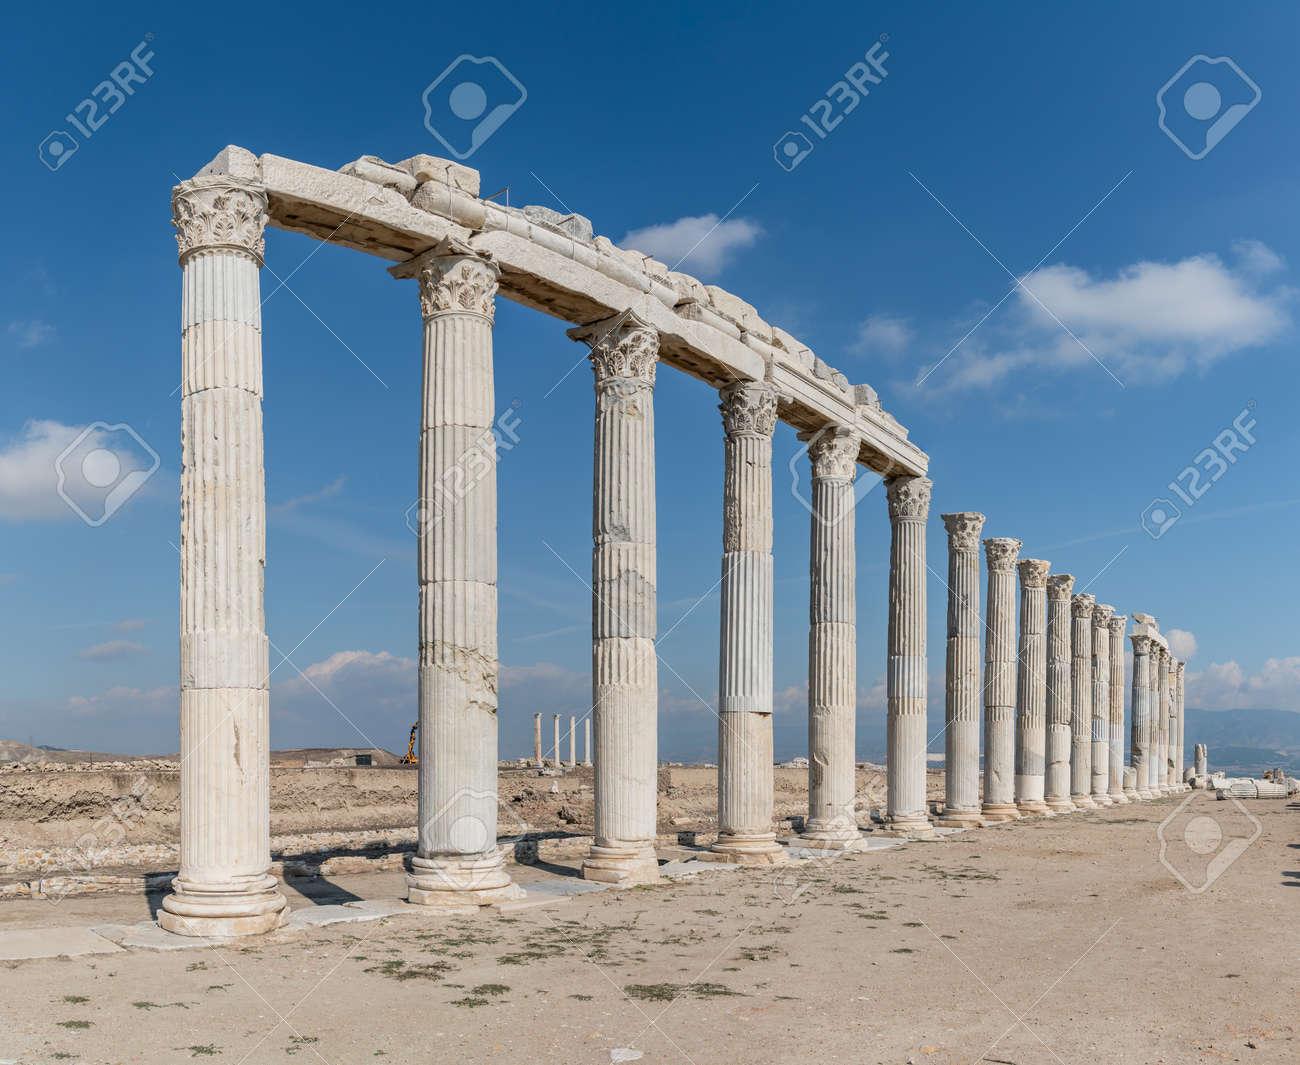 Denizli, Turkey - October 2019: Laodikeia ancient city ruins in Pamukkale, Denizli, Turkey - 164355939